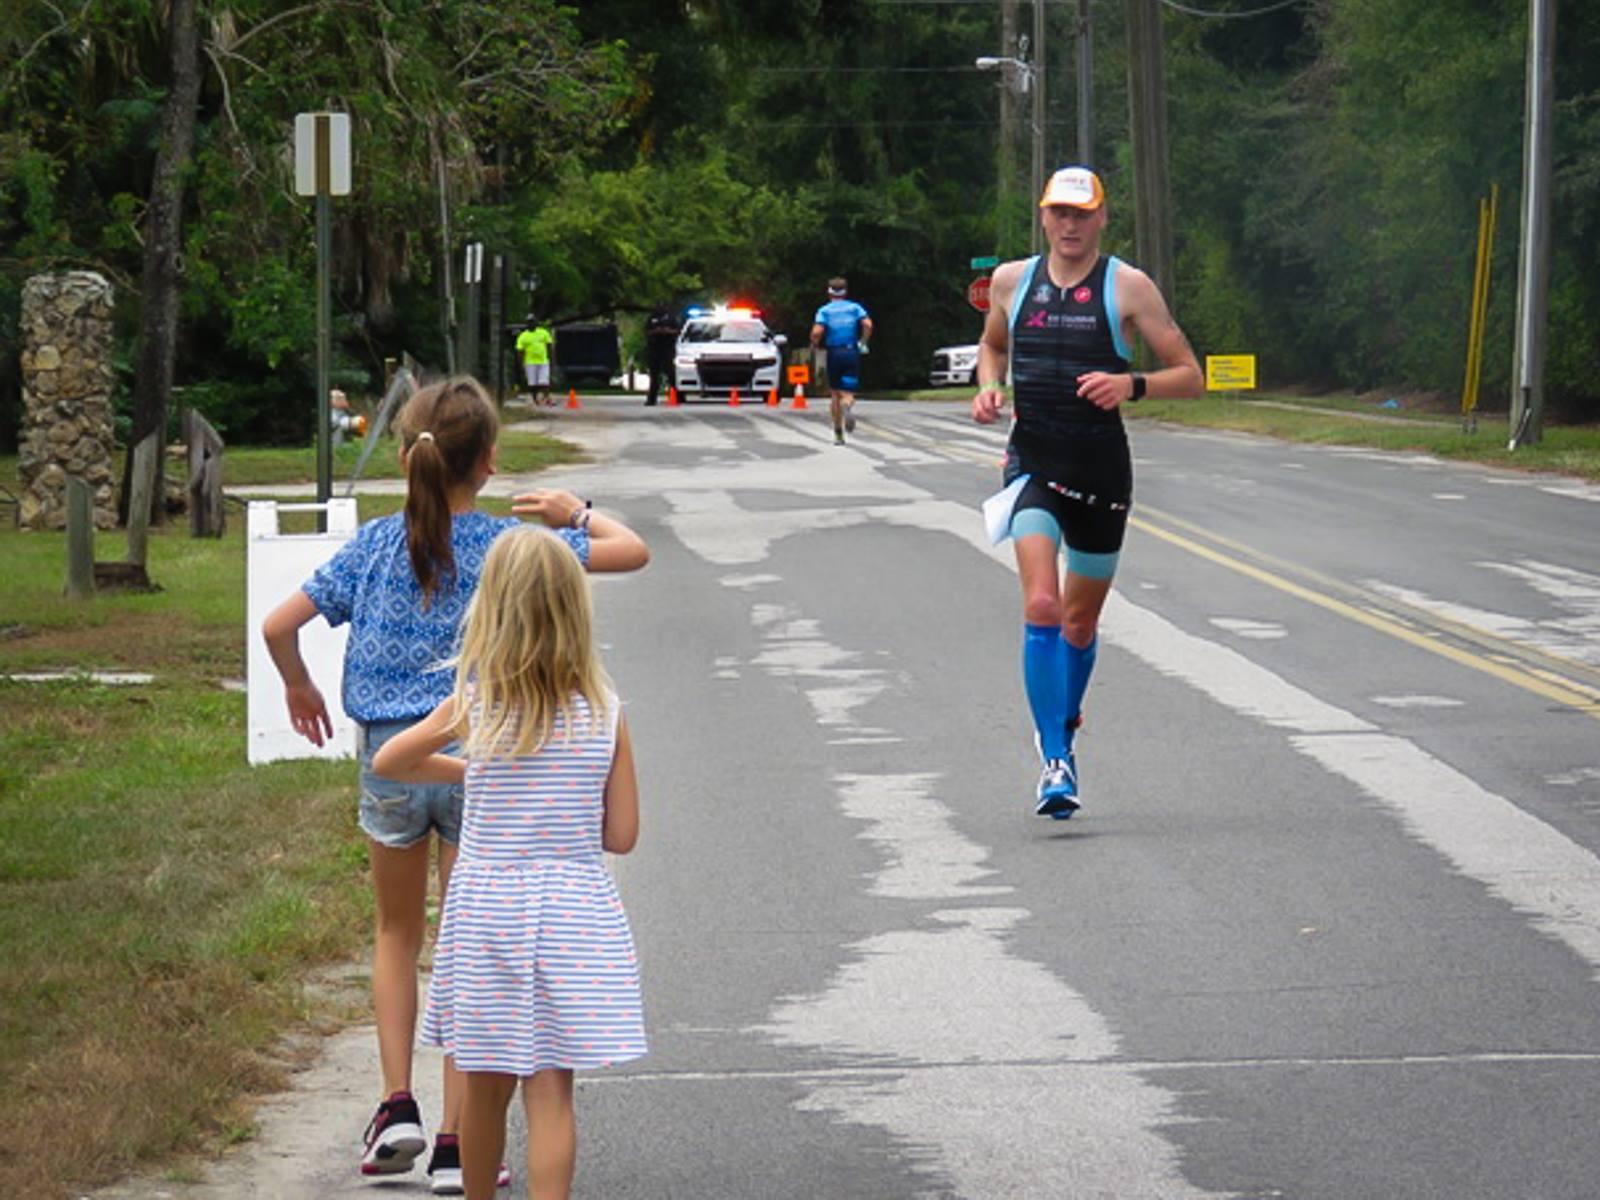 Dominic De Caluwe in de Ironman Florida (foto: Domini De Caluwe)